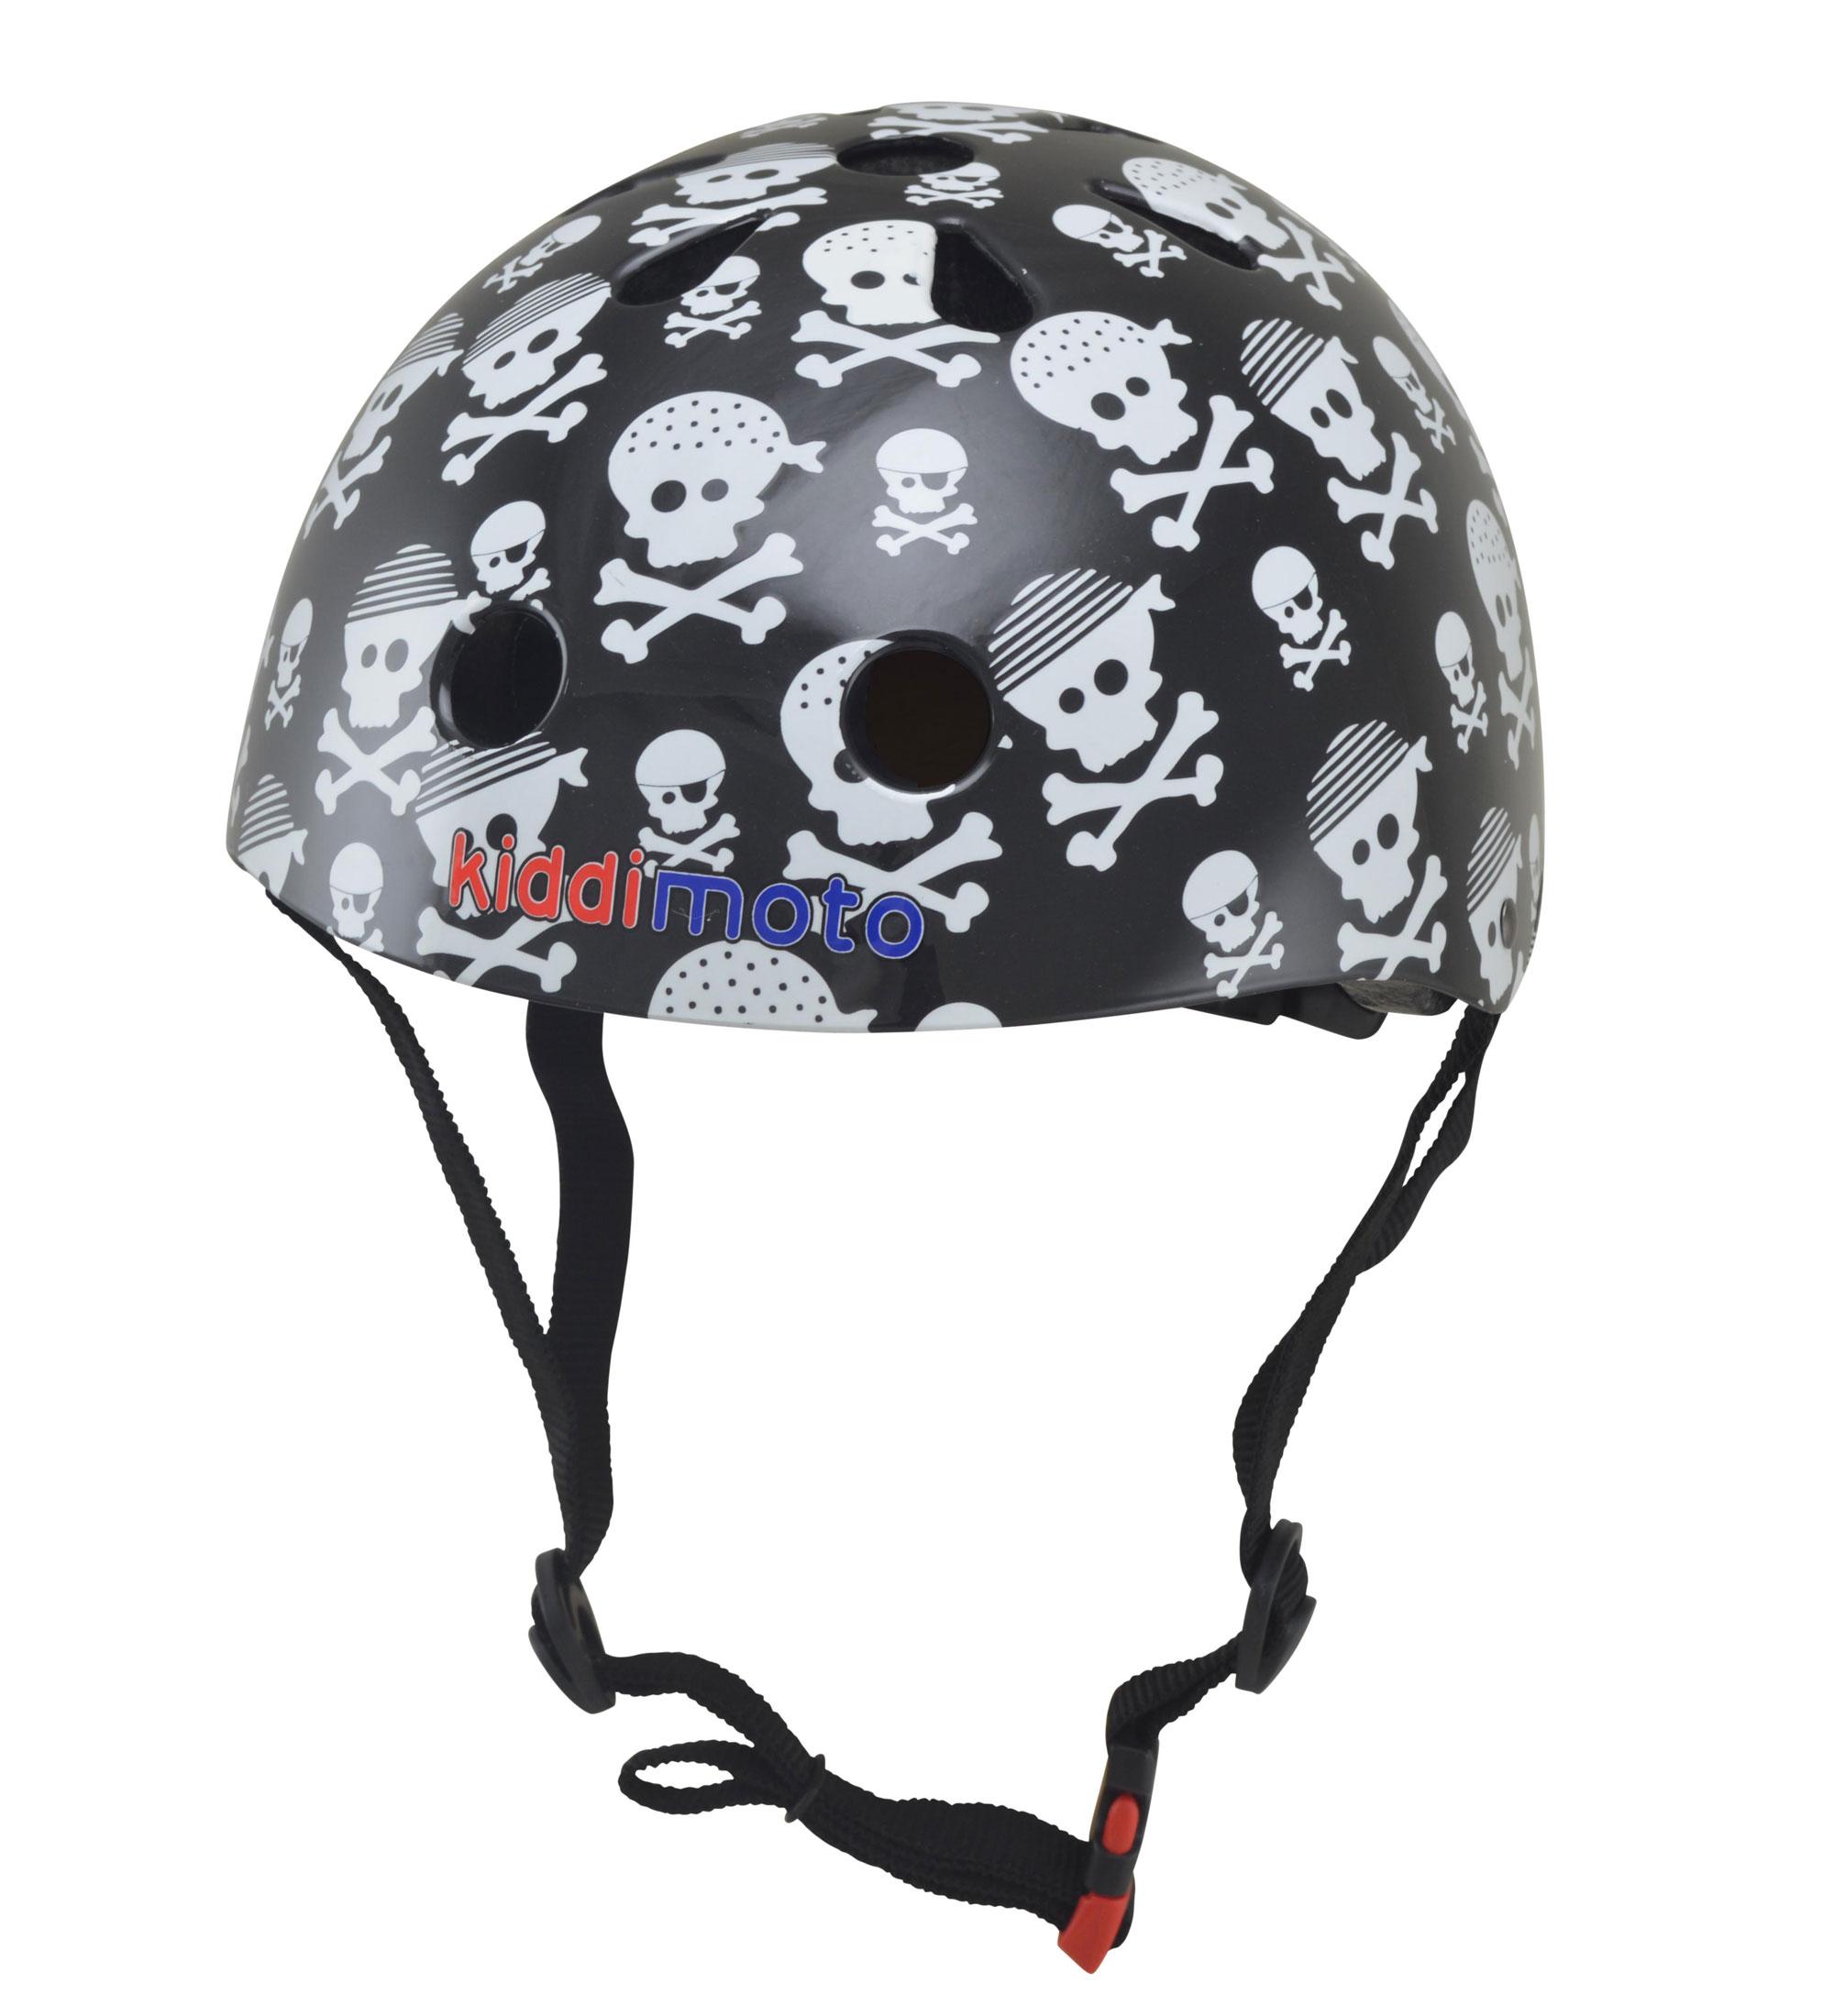 kiddimoto Fahrradhelm / Kinderhelm Größe M Pirat Bild 1